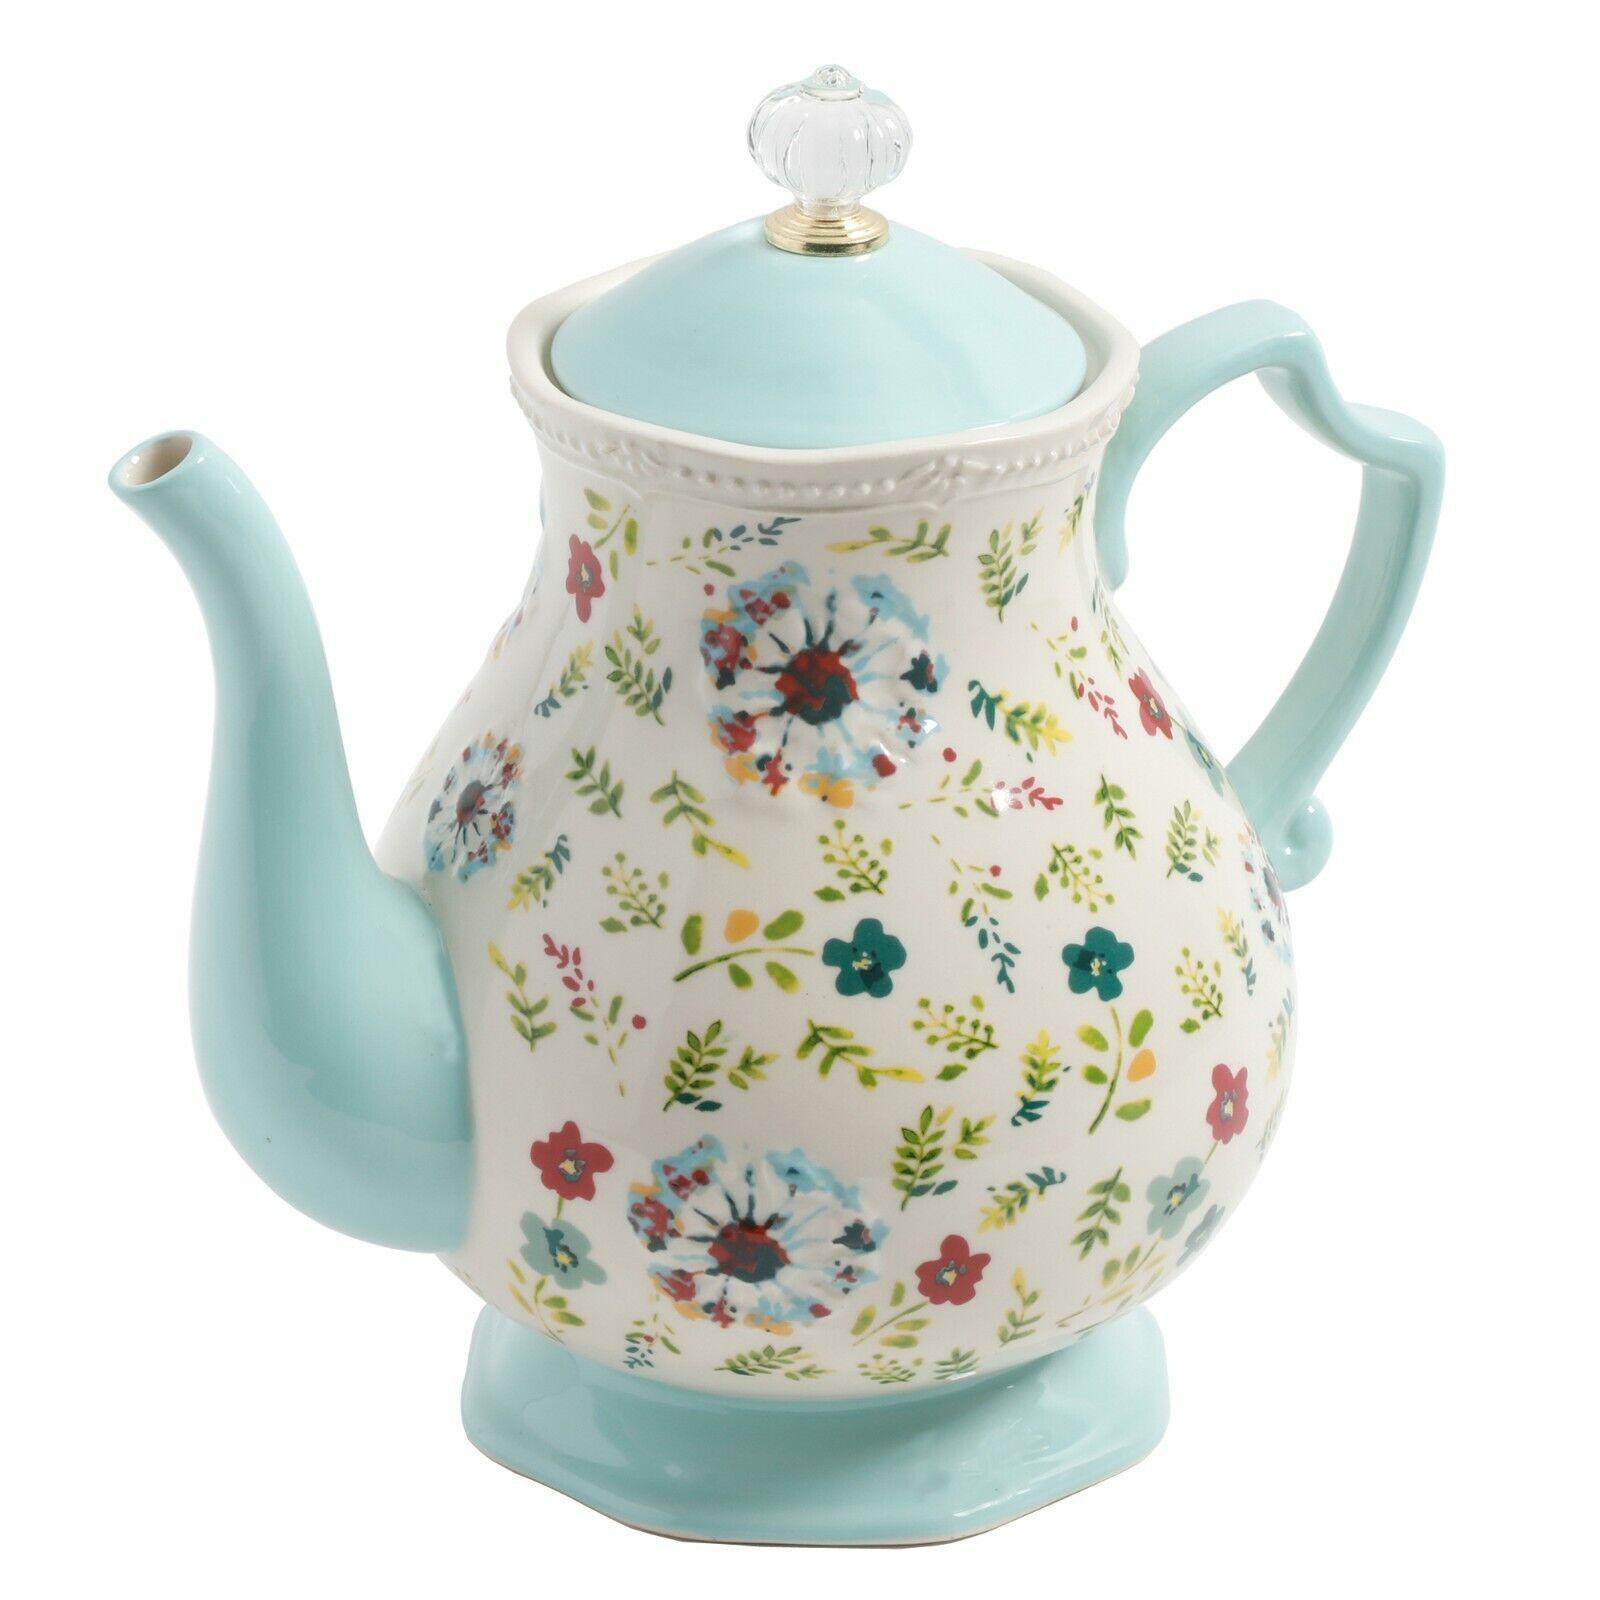 THE PIONEER WOMAN Tea Kettle Teapot - Kari Teal Mint Green F